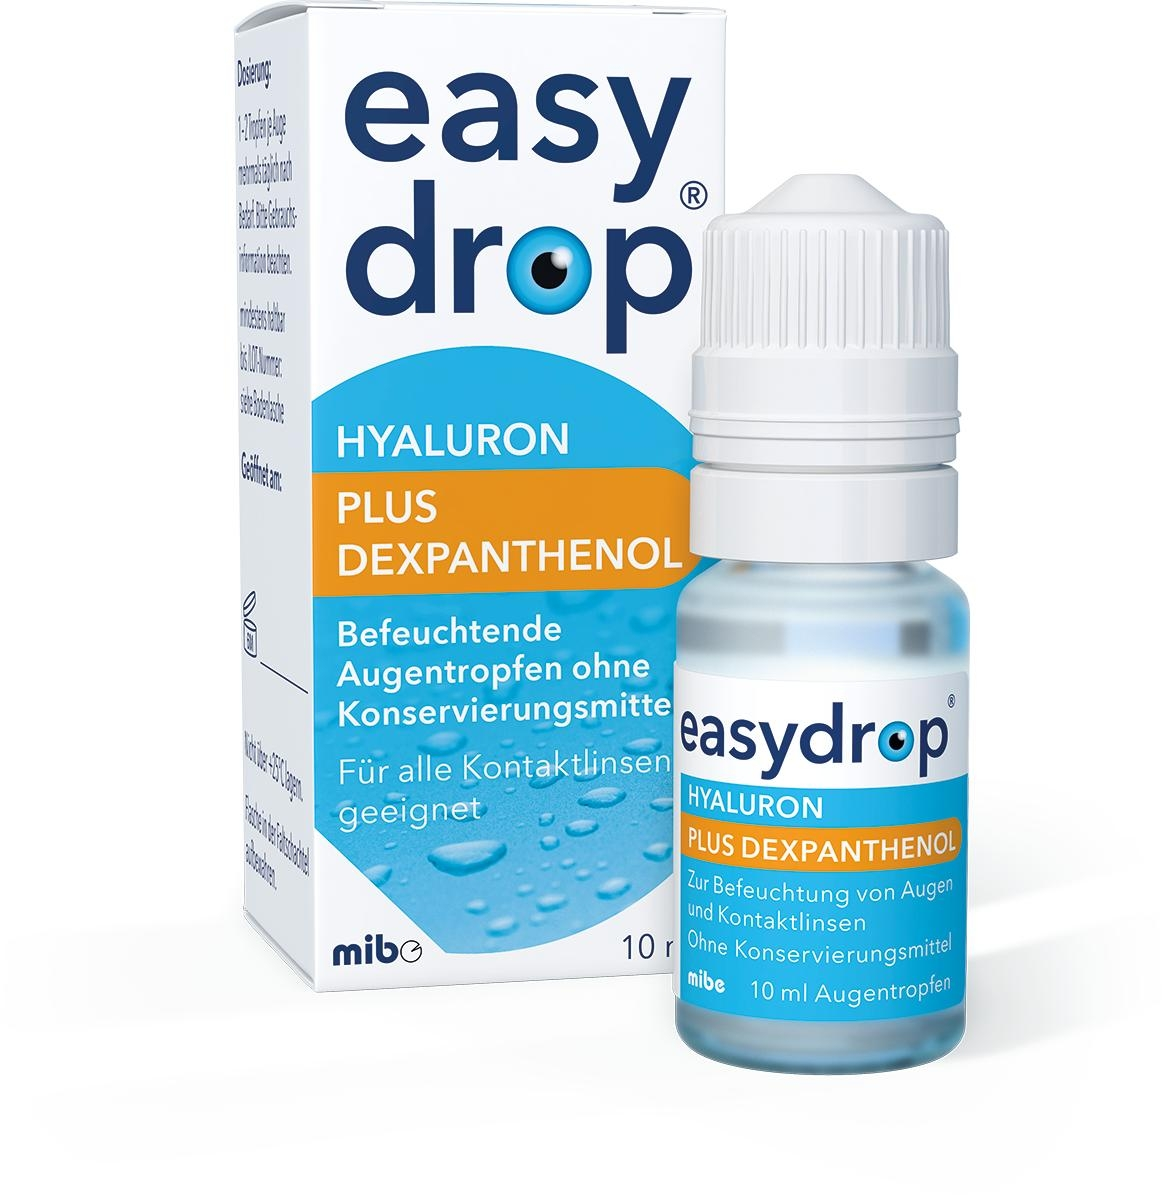 Easydrop Hyaluron plus Dexpanthenol Augentropfen 10 ml